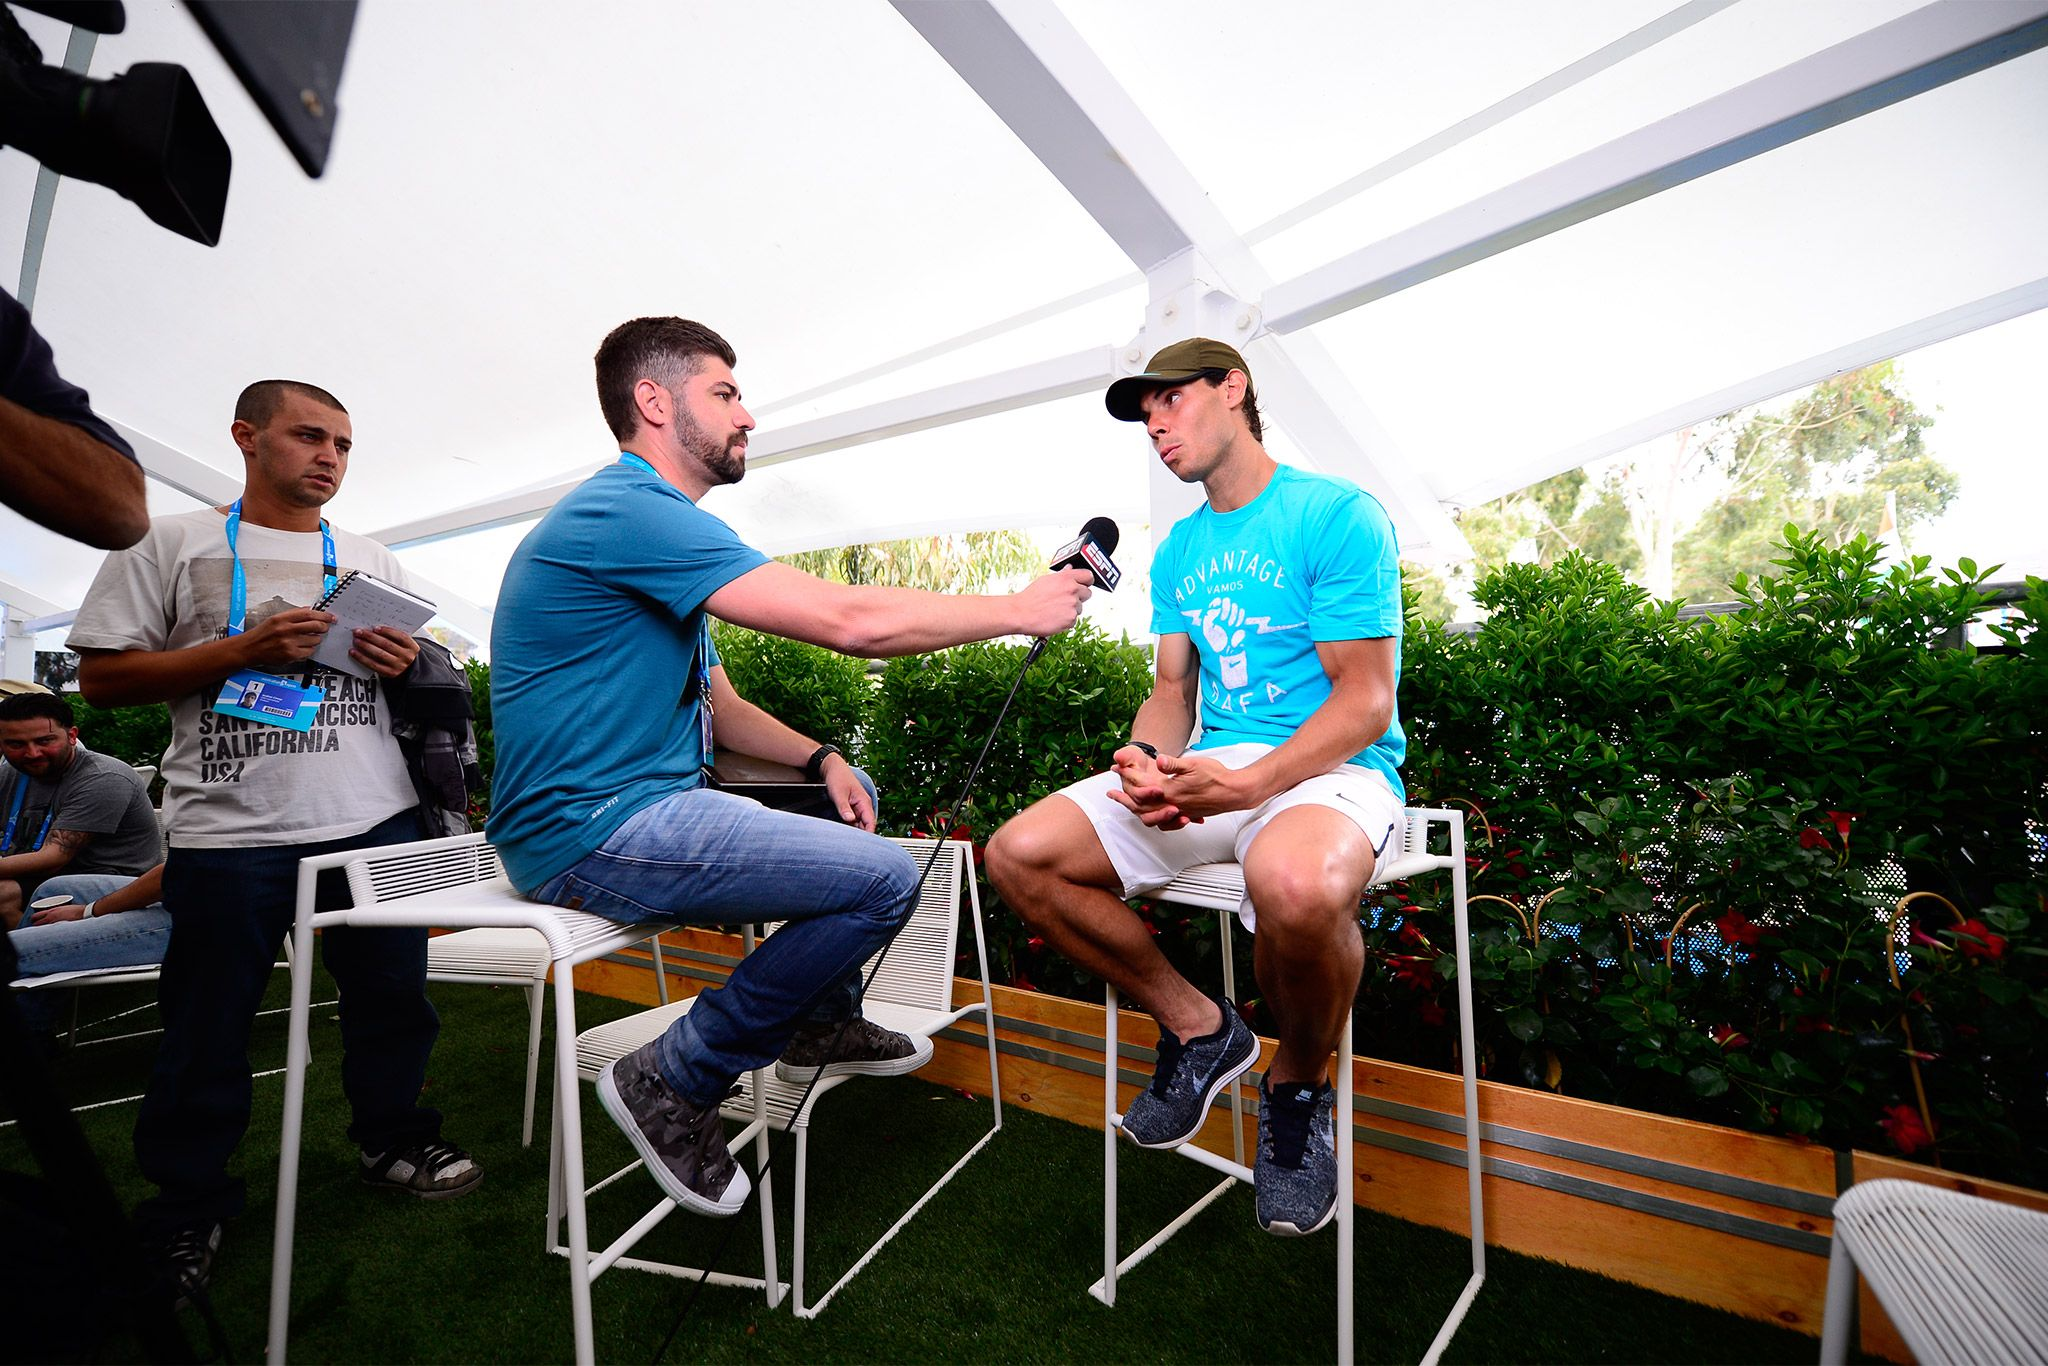 Rafael Nadal gives an interview ahead of the Australian Open 2014. - Ben Solomon/Tennis Australia